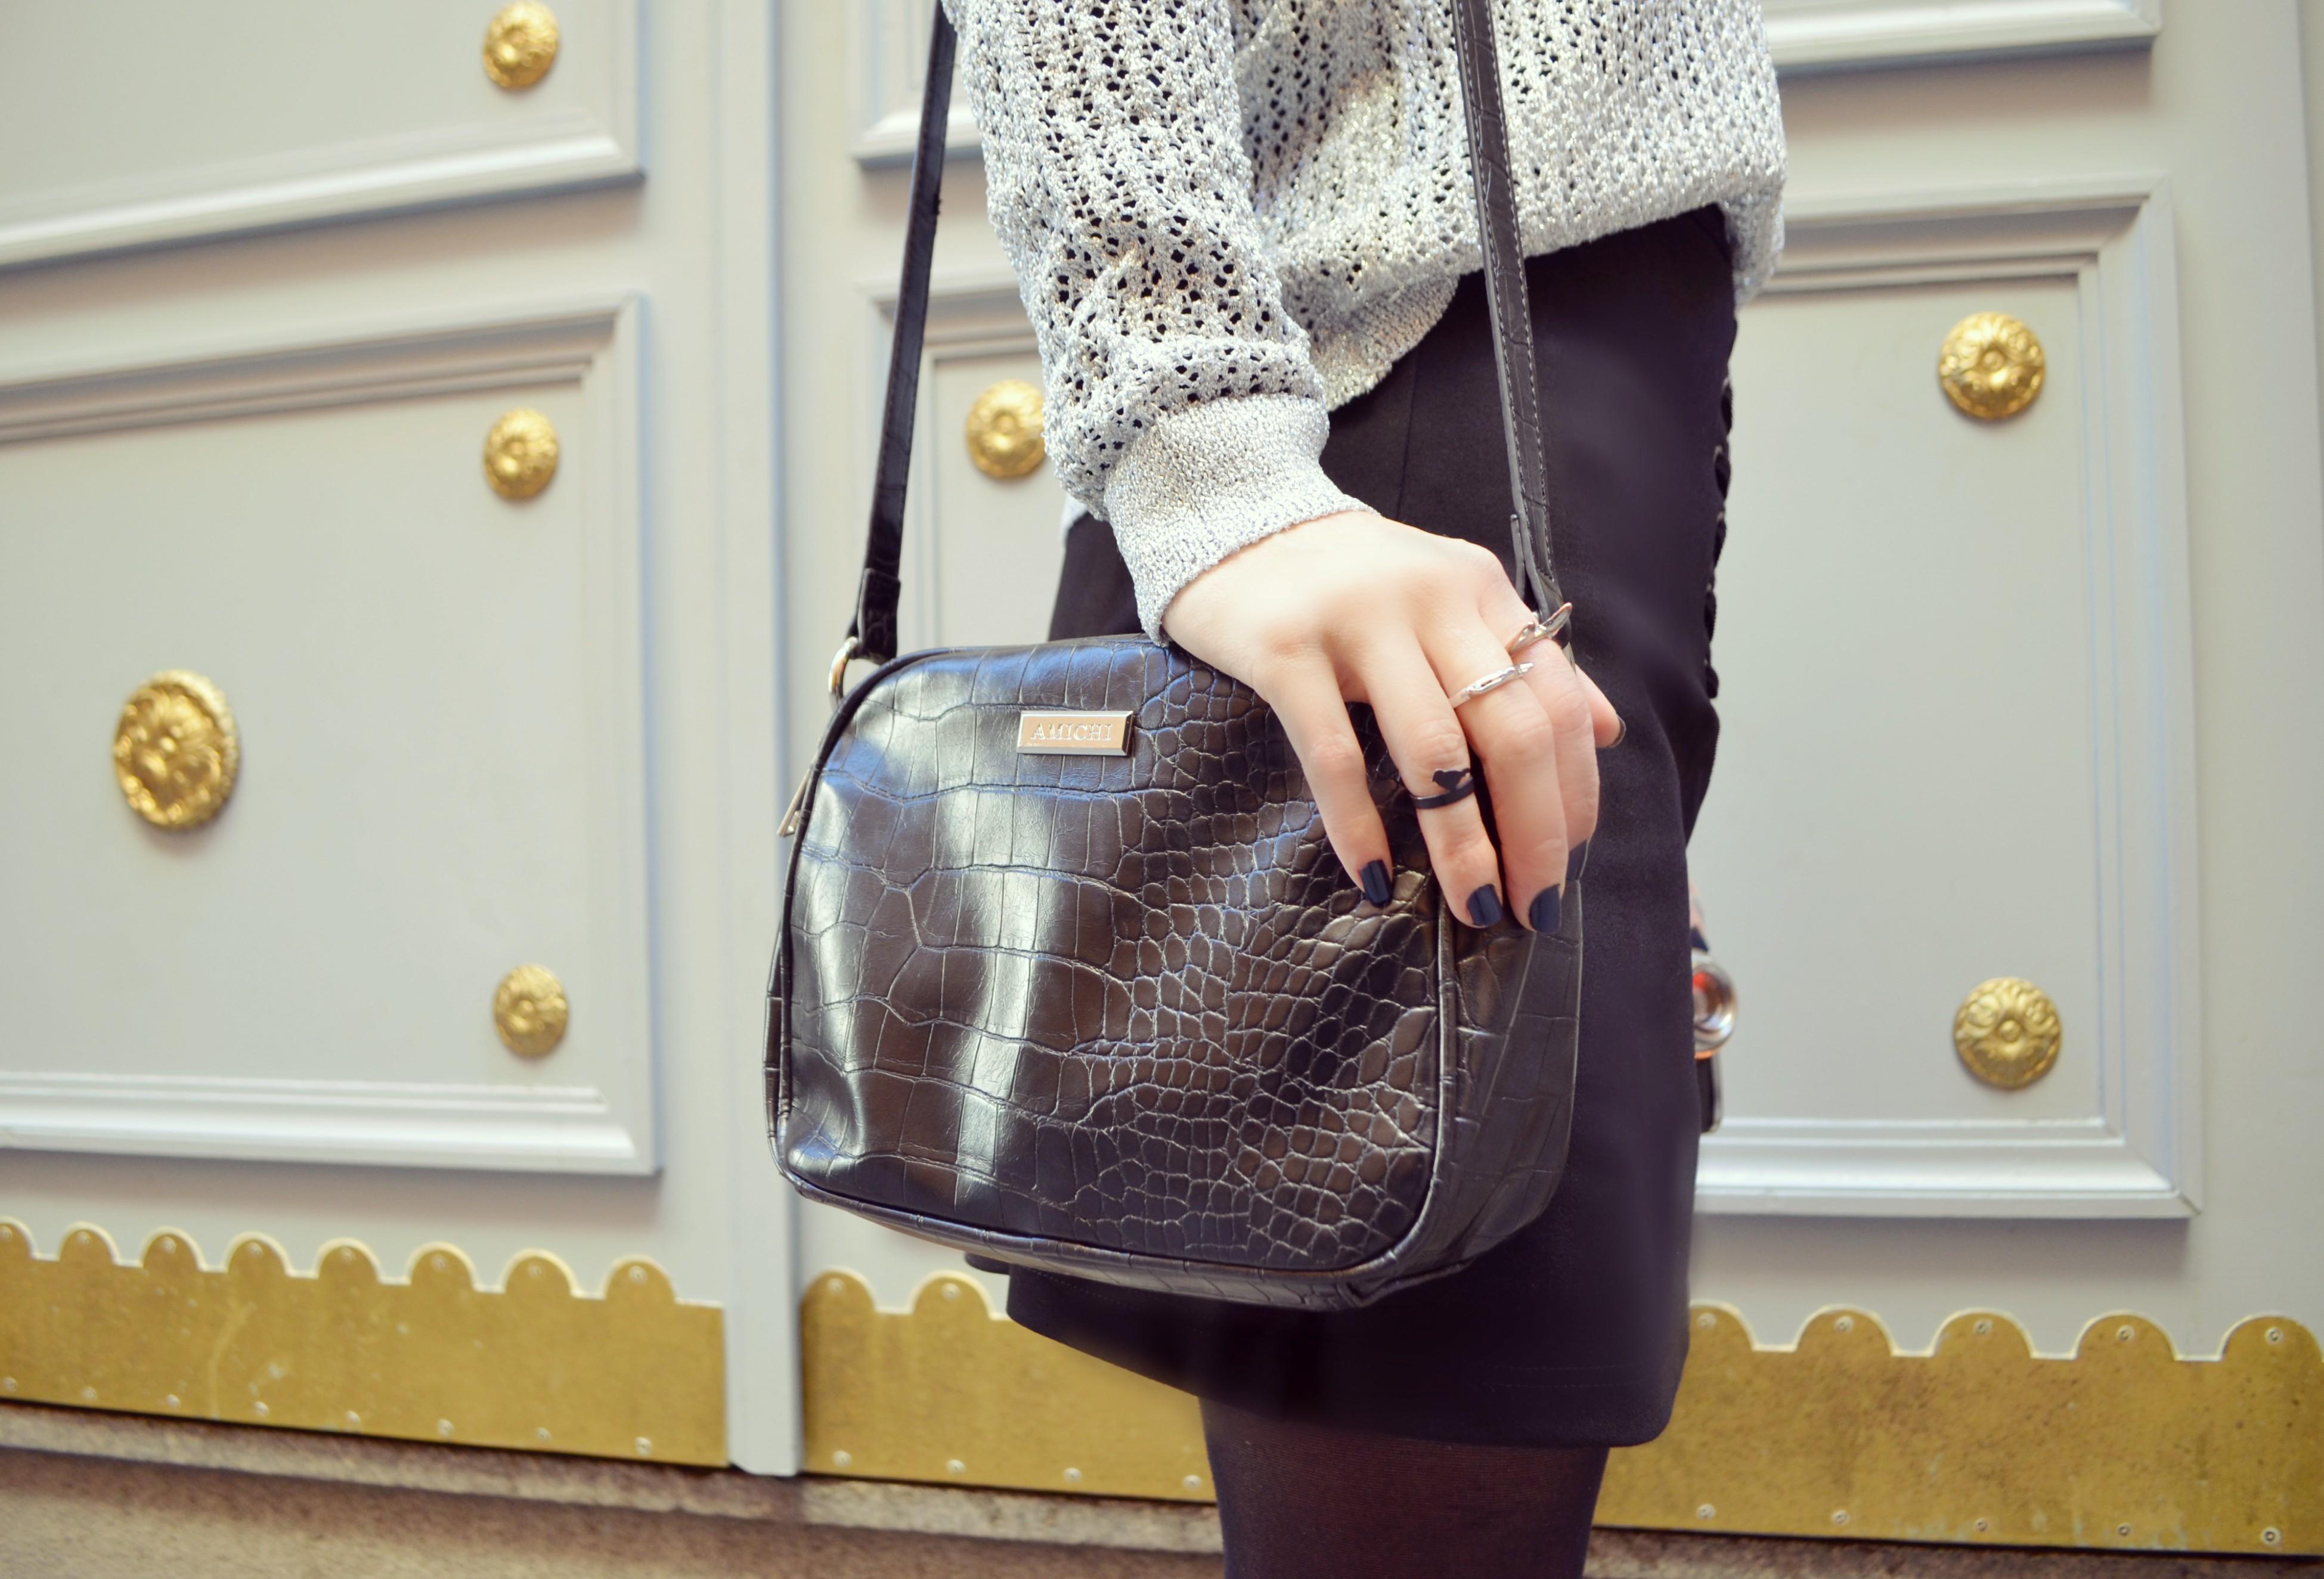 Bolso-amichi-blog-de-moda-ChicAdicta-fashionista-Chic-Adicta-falda-negra-look-plata-silver-outfit-PiensaenChic-Piensa-en-Chic